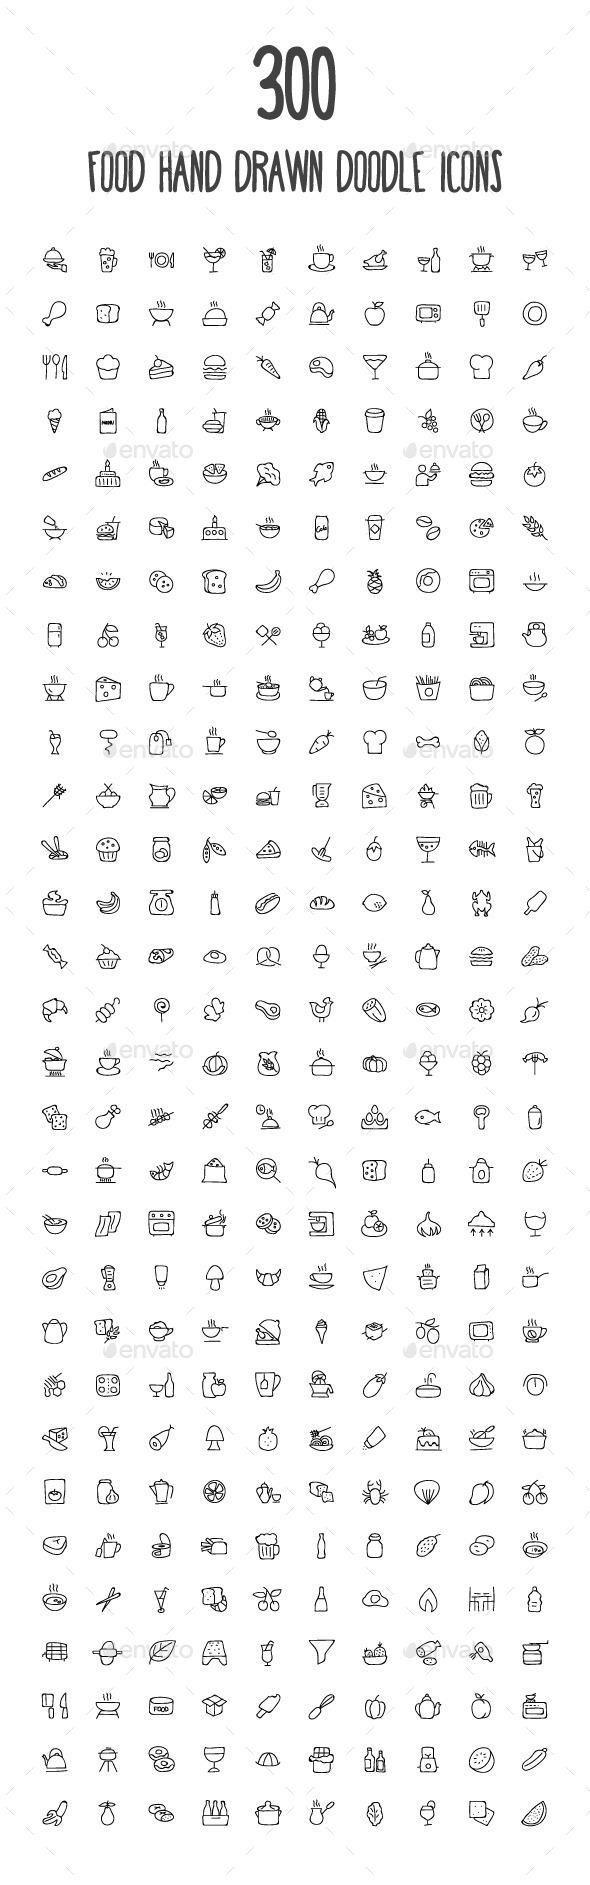 Cute icon doodle